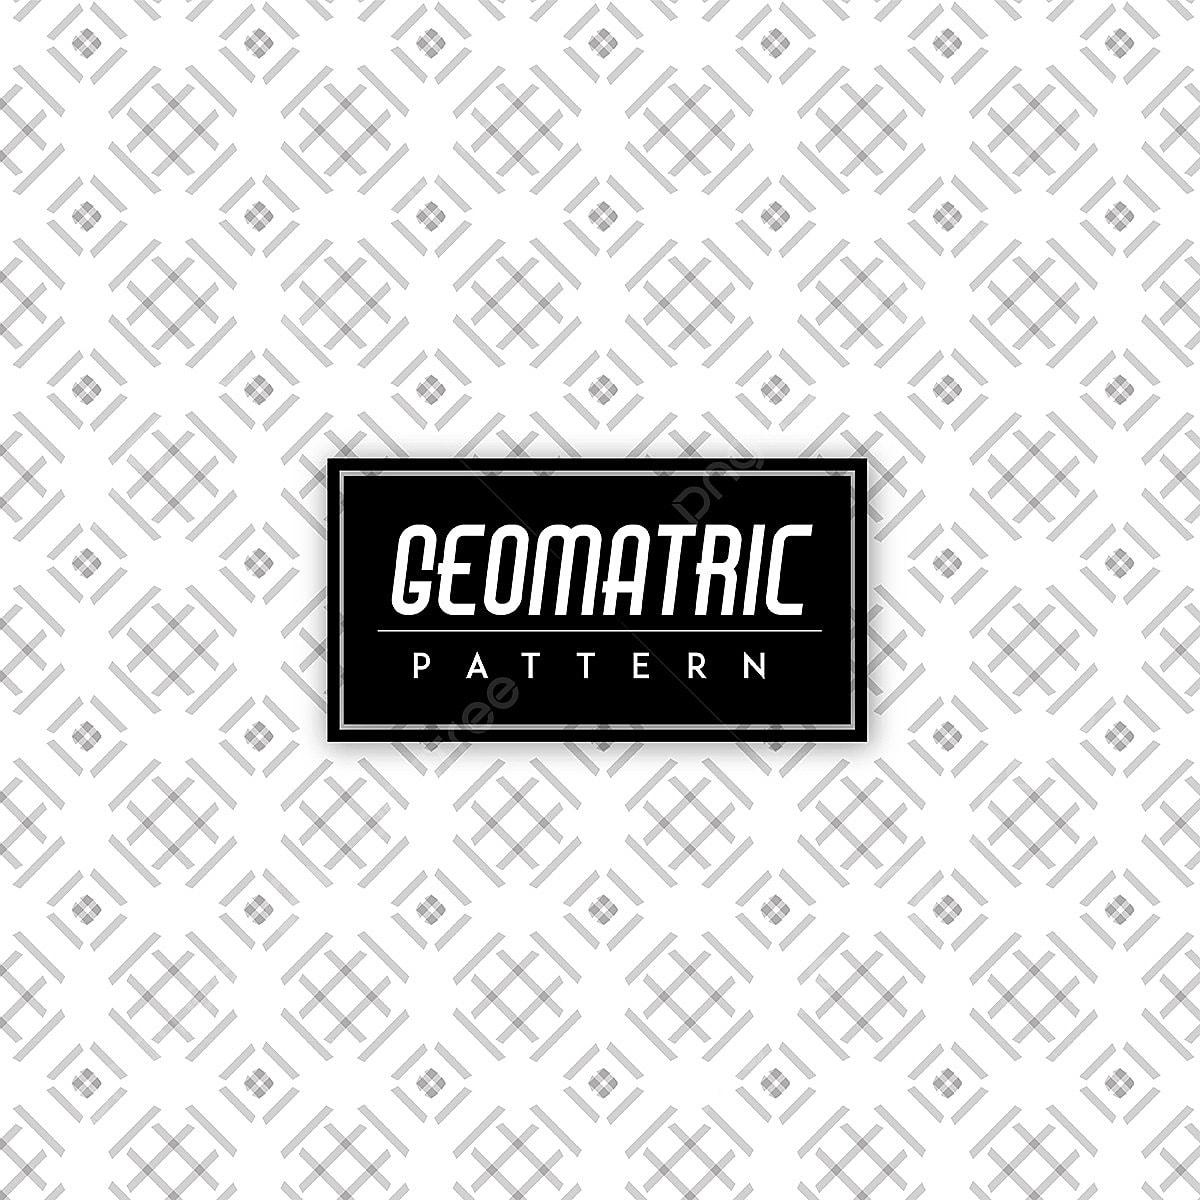 Hitam Dan Putih Geomatric Lancar Pola Latar Belakang Corak